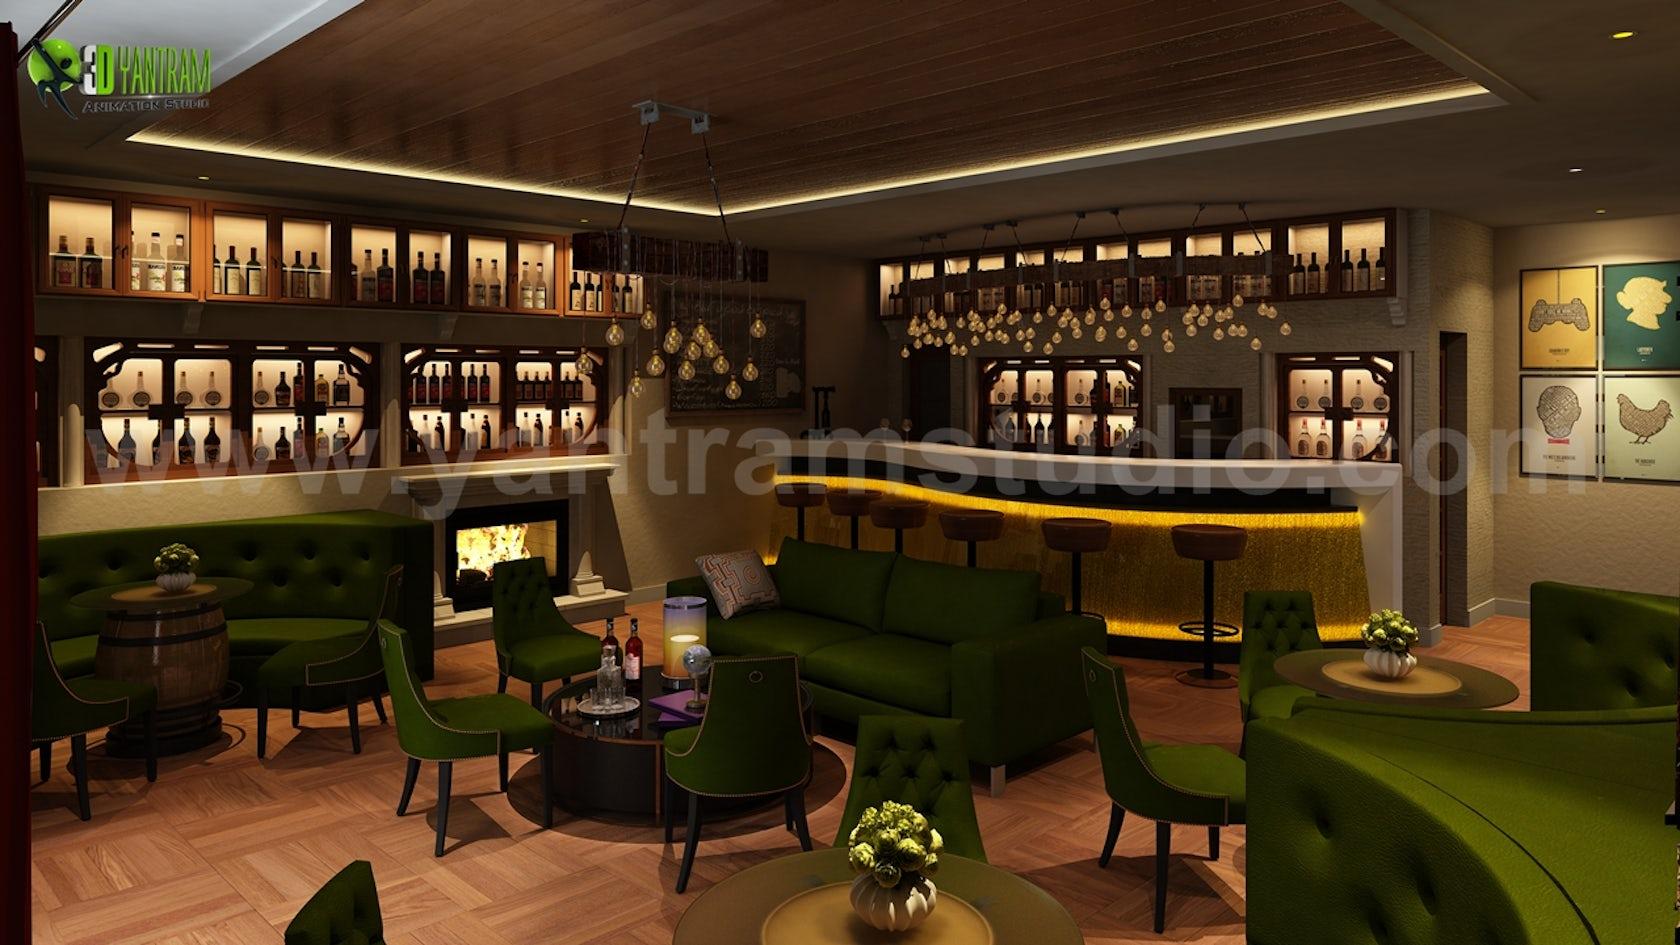 Bar & Restaurant interior design by Yantram 3D Interior ...